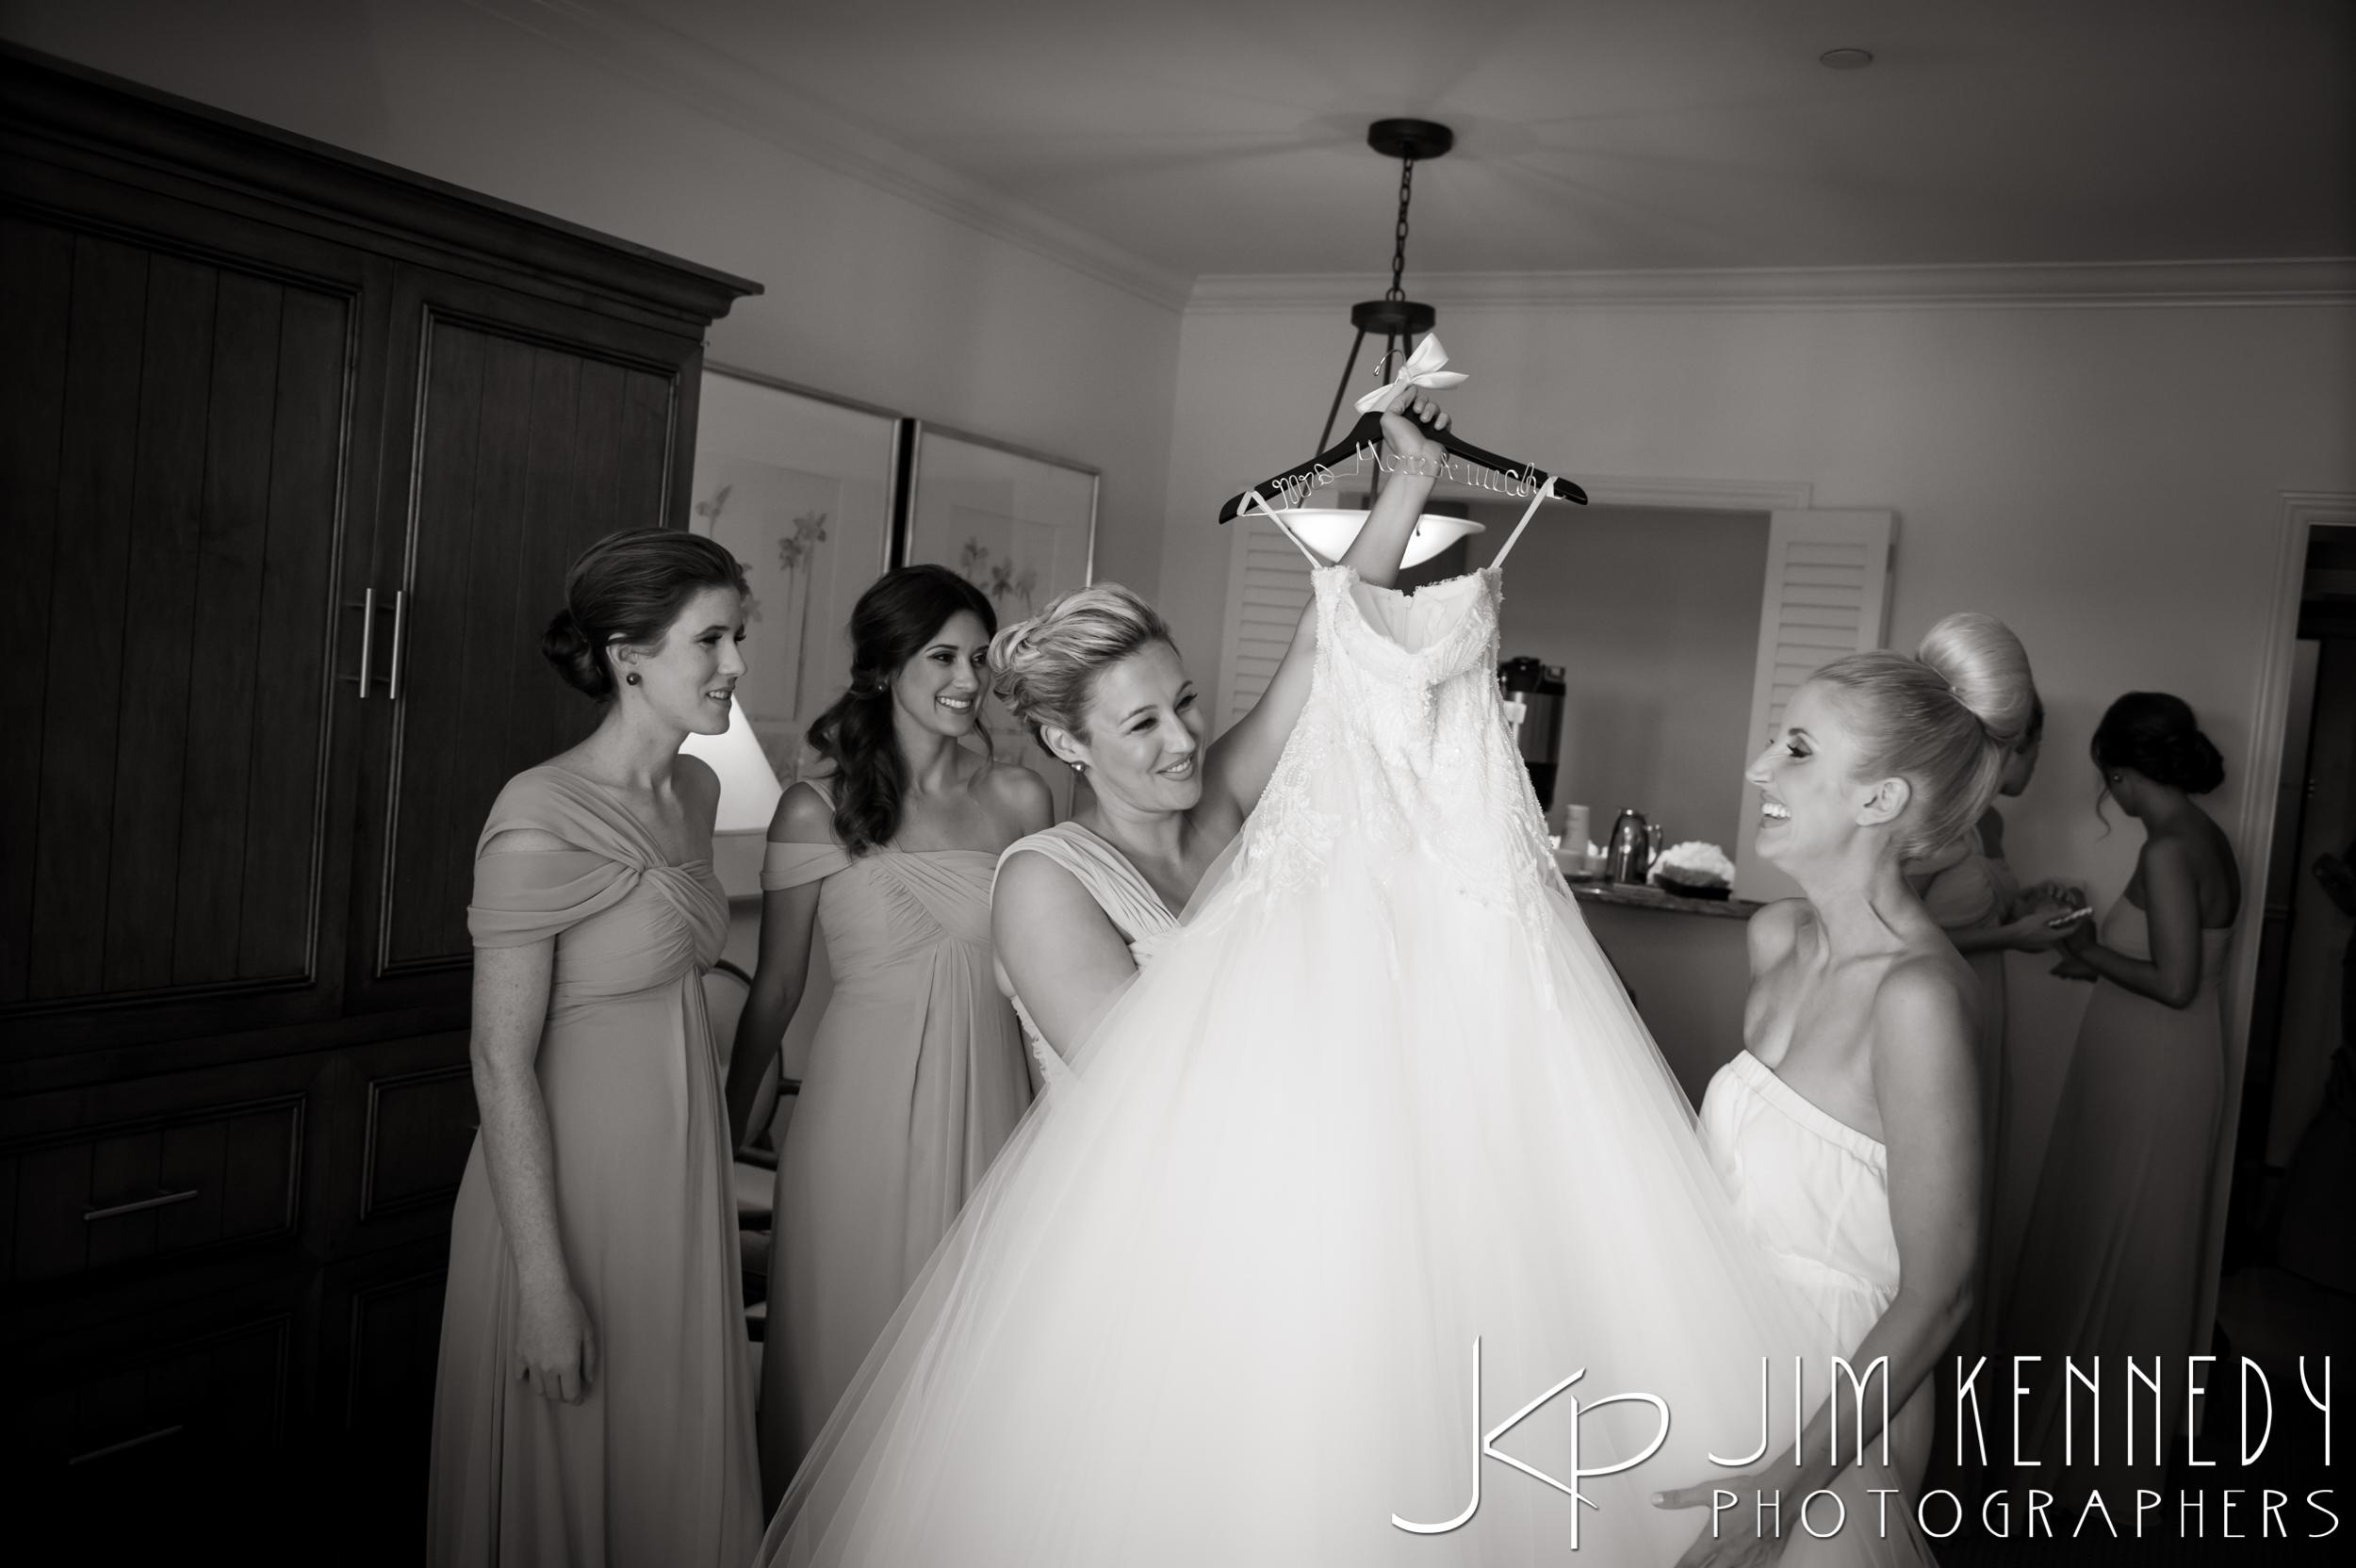 balboa-bay-resort-wedding-photography_0020.JPG